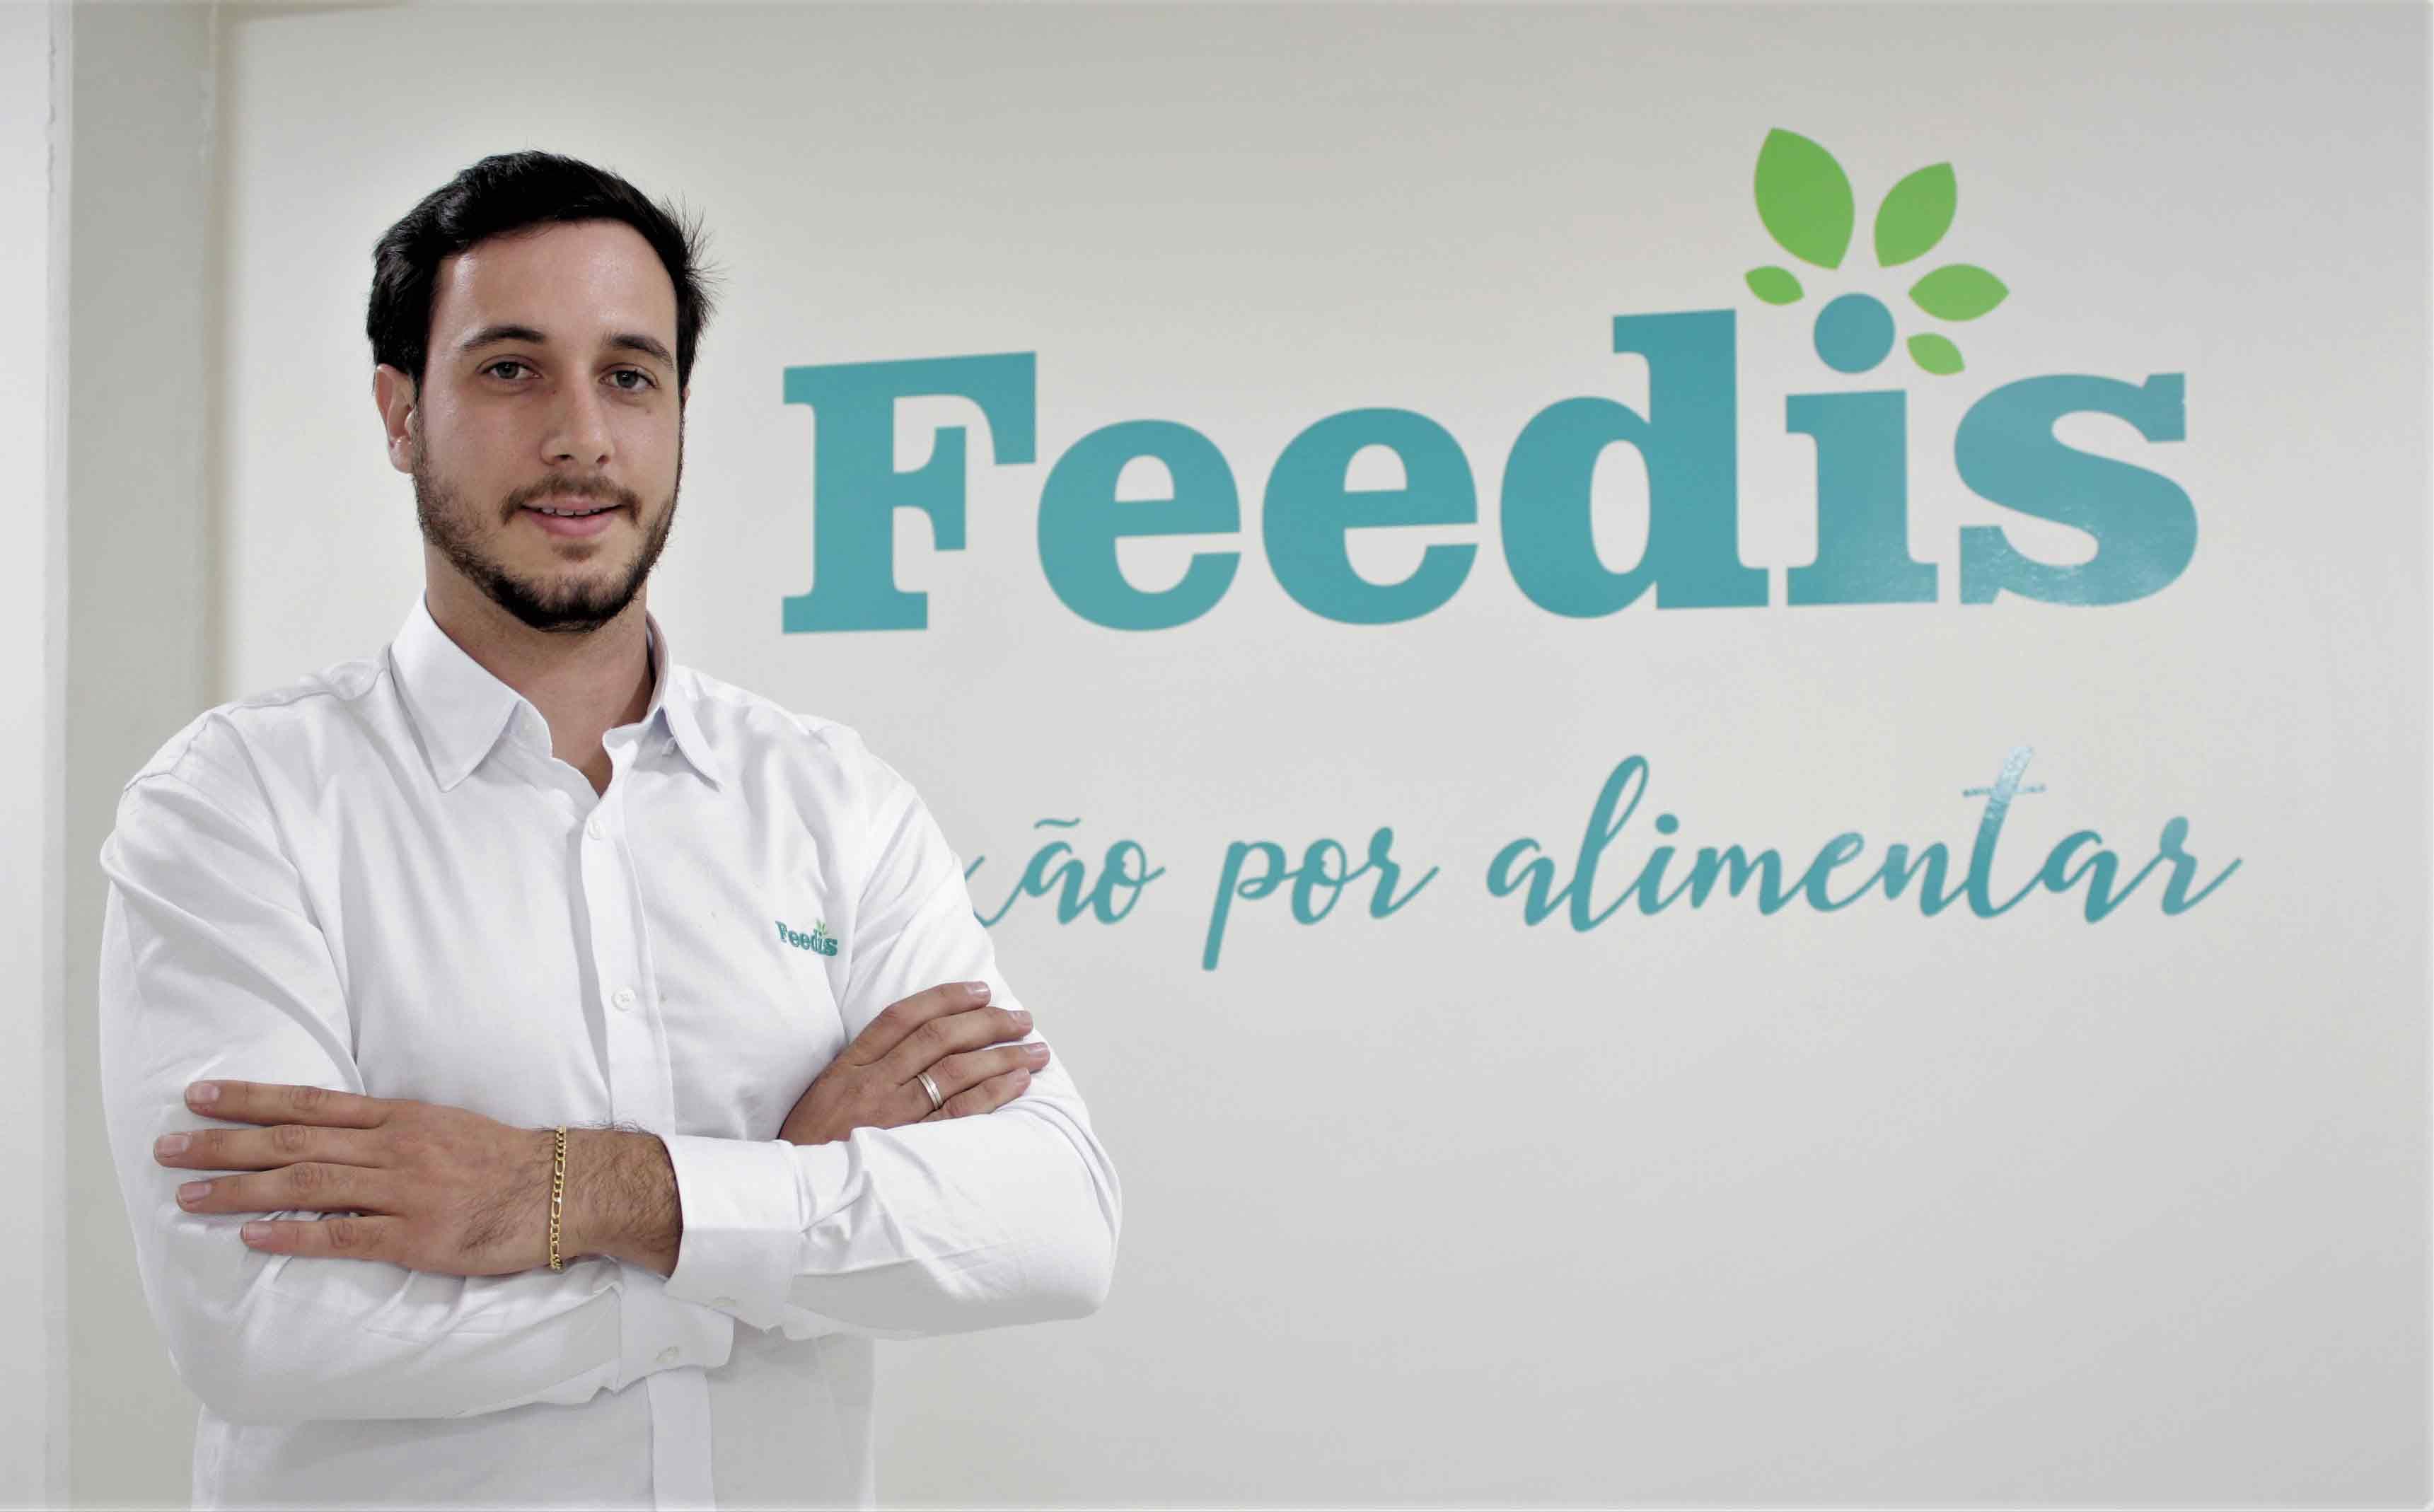 Felipe chega para somar e dar todo o suporte para os clientes Feedis®